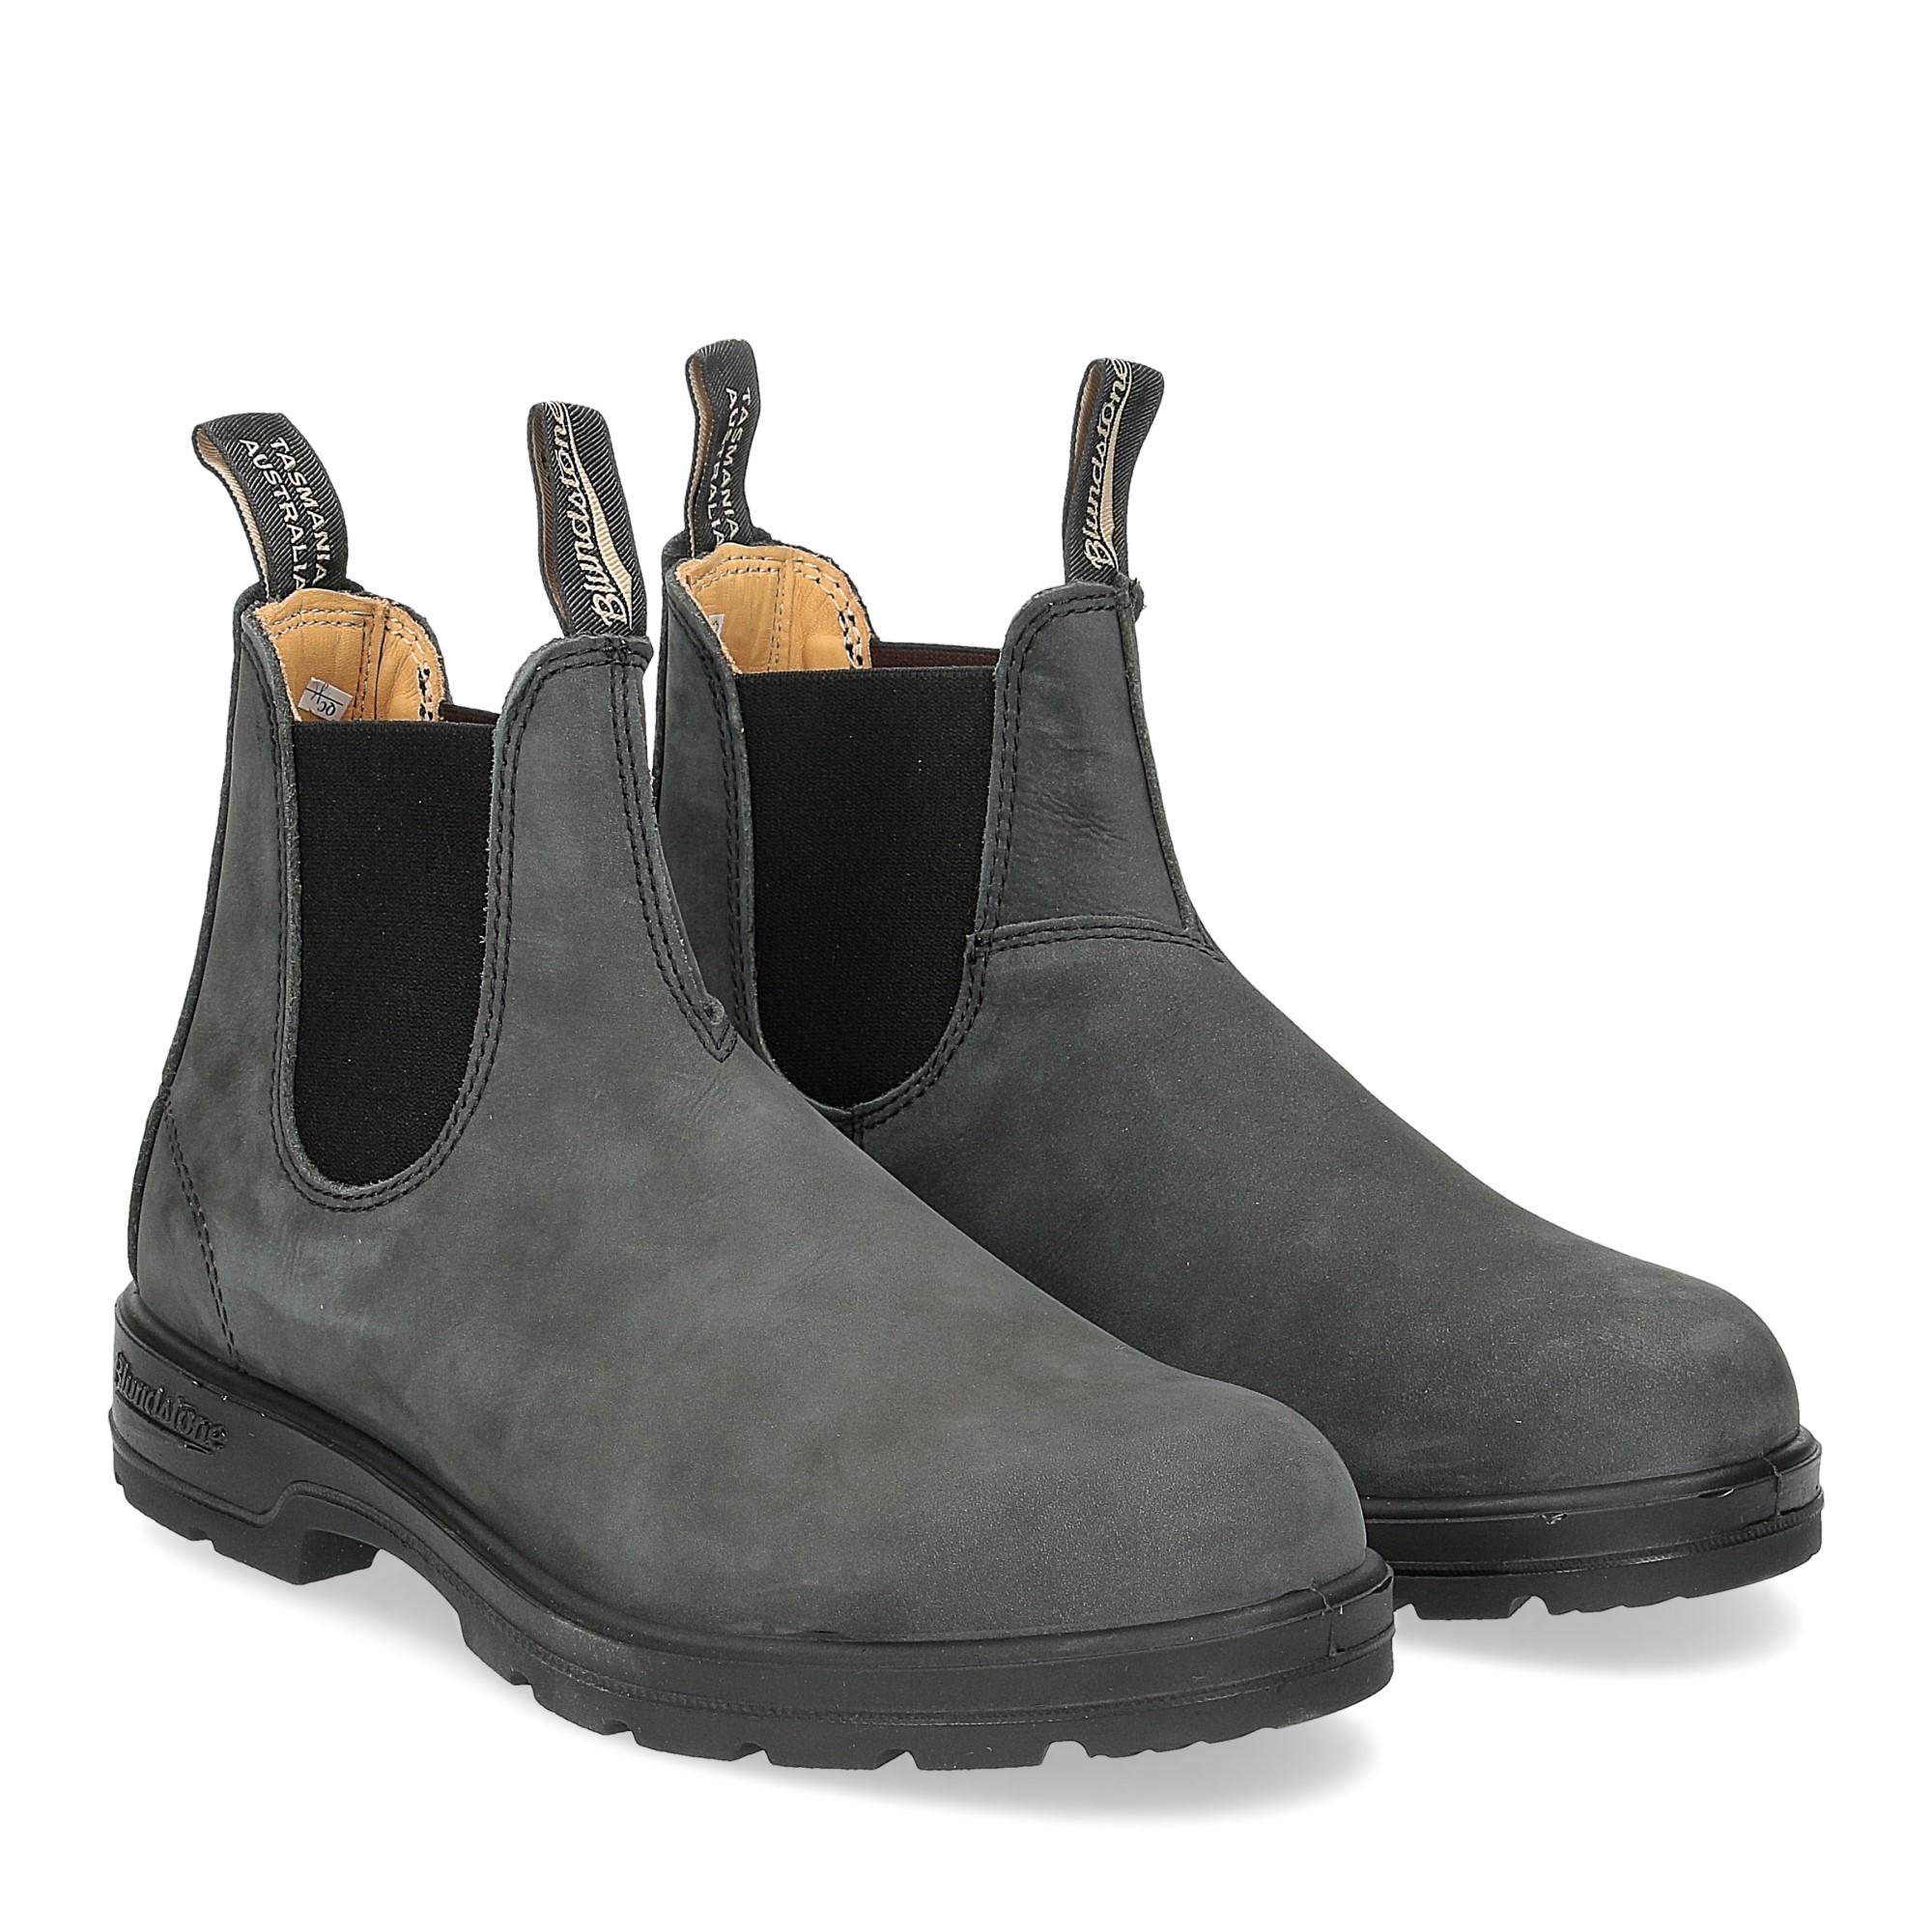 Blundstone 587 rustik grey